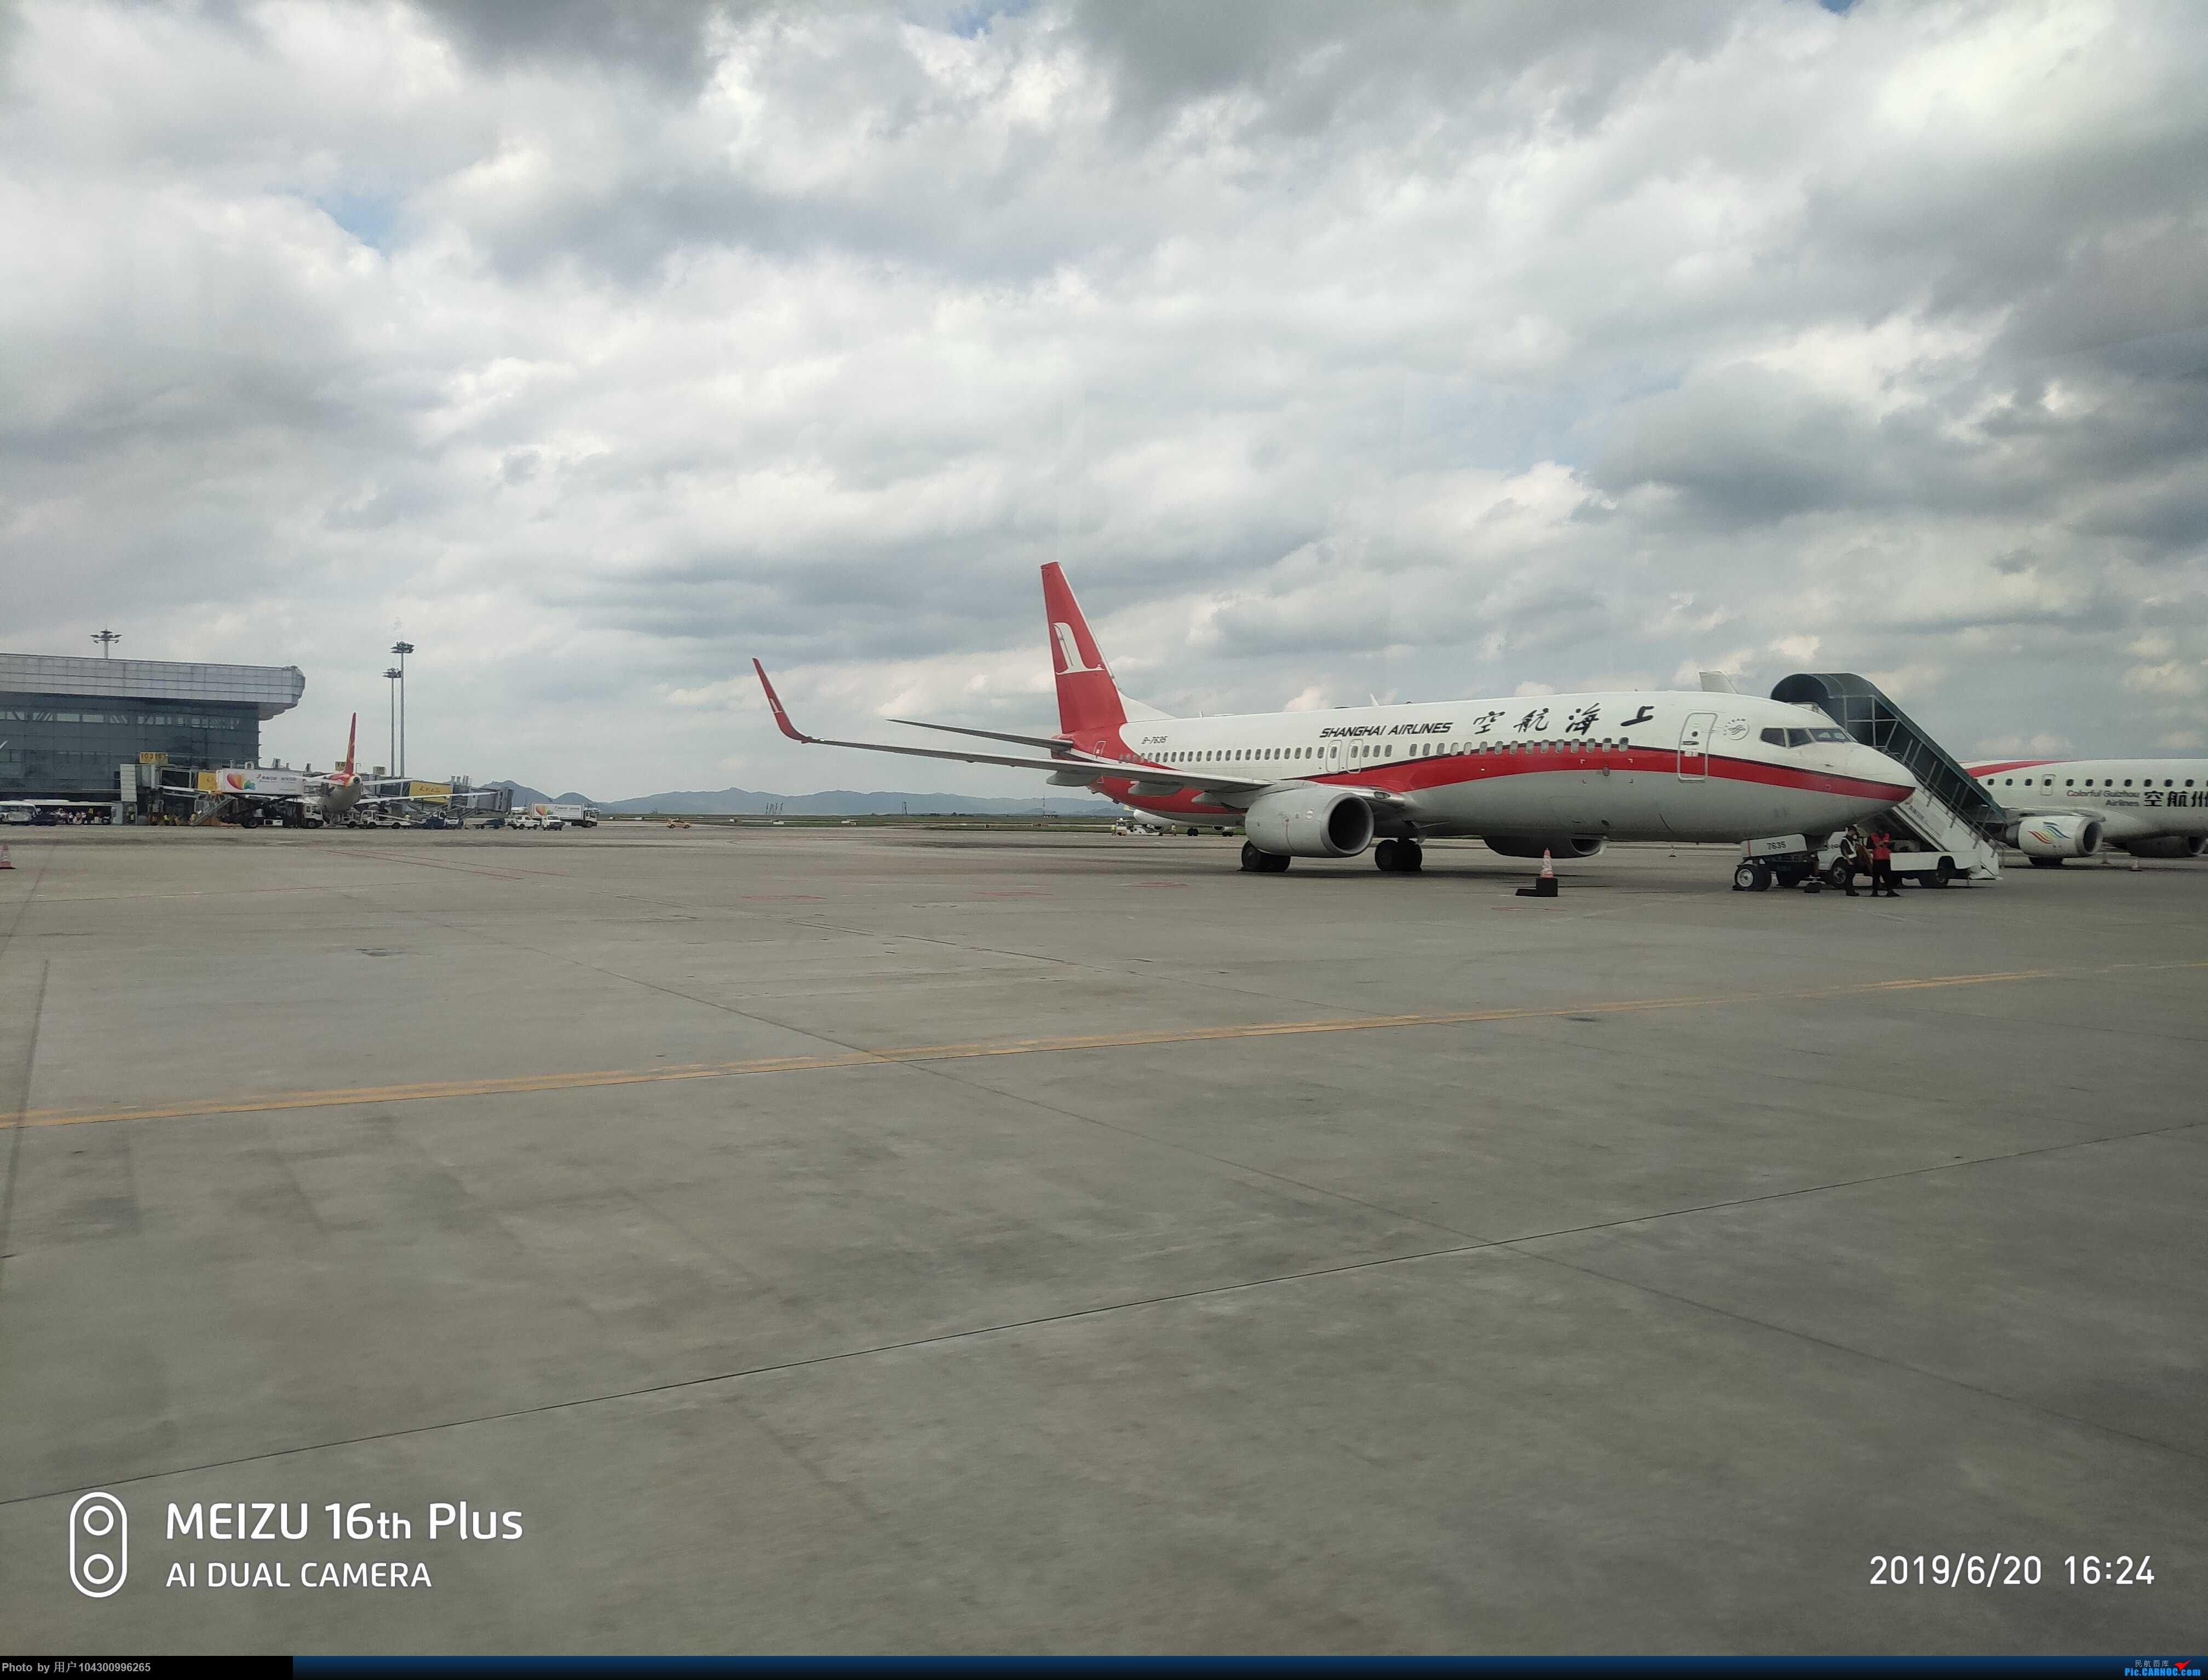 Re:[原创]DM哥飞行游记--贵阳往返荔波2日游 BOEING 737-800 B-7635 中国贵阳龙洞堡国际机场